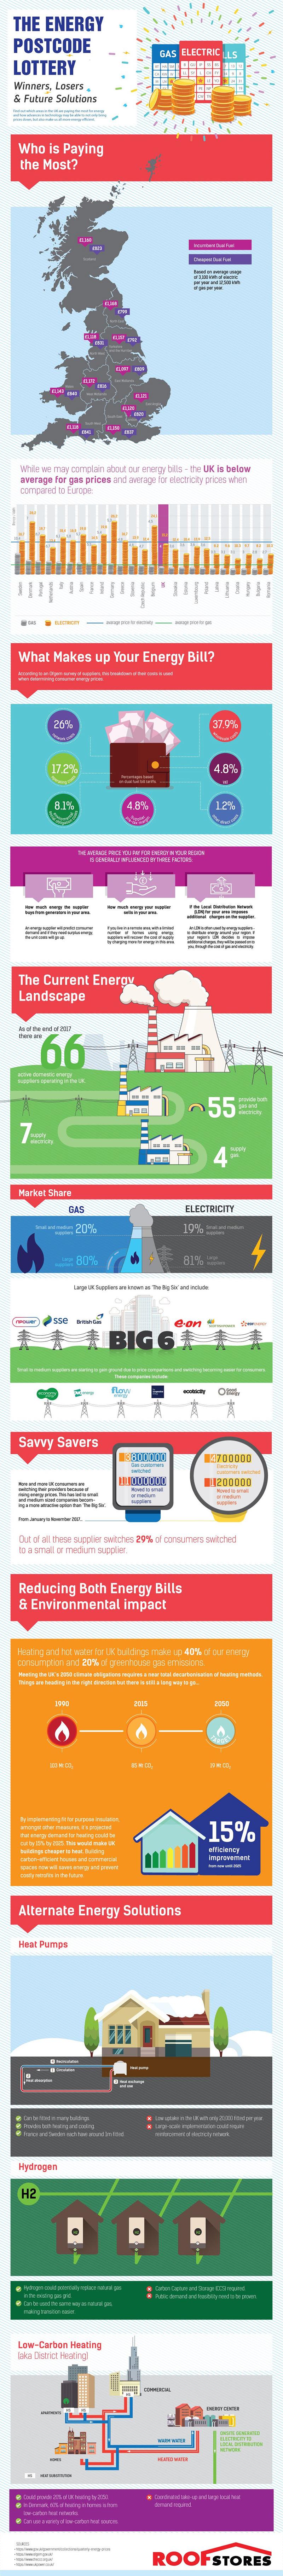 energy postcode lottery infographic